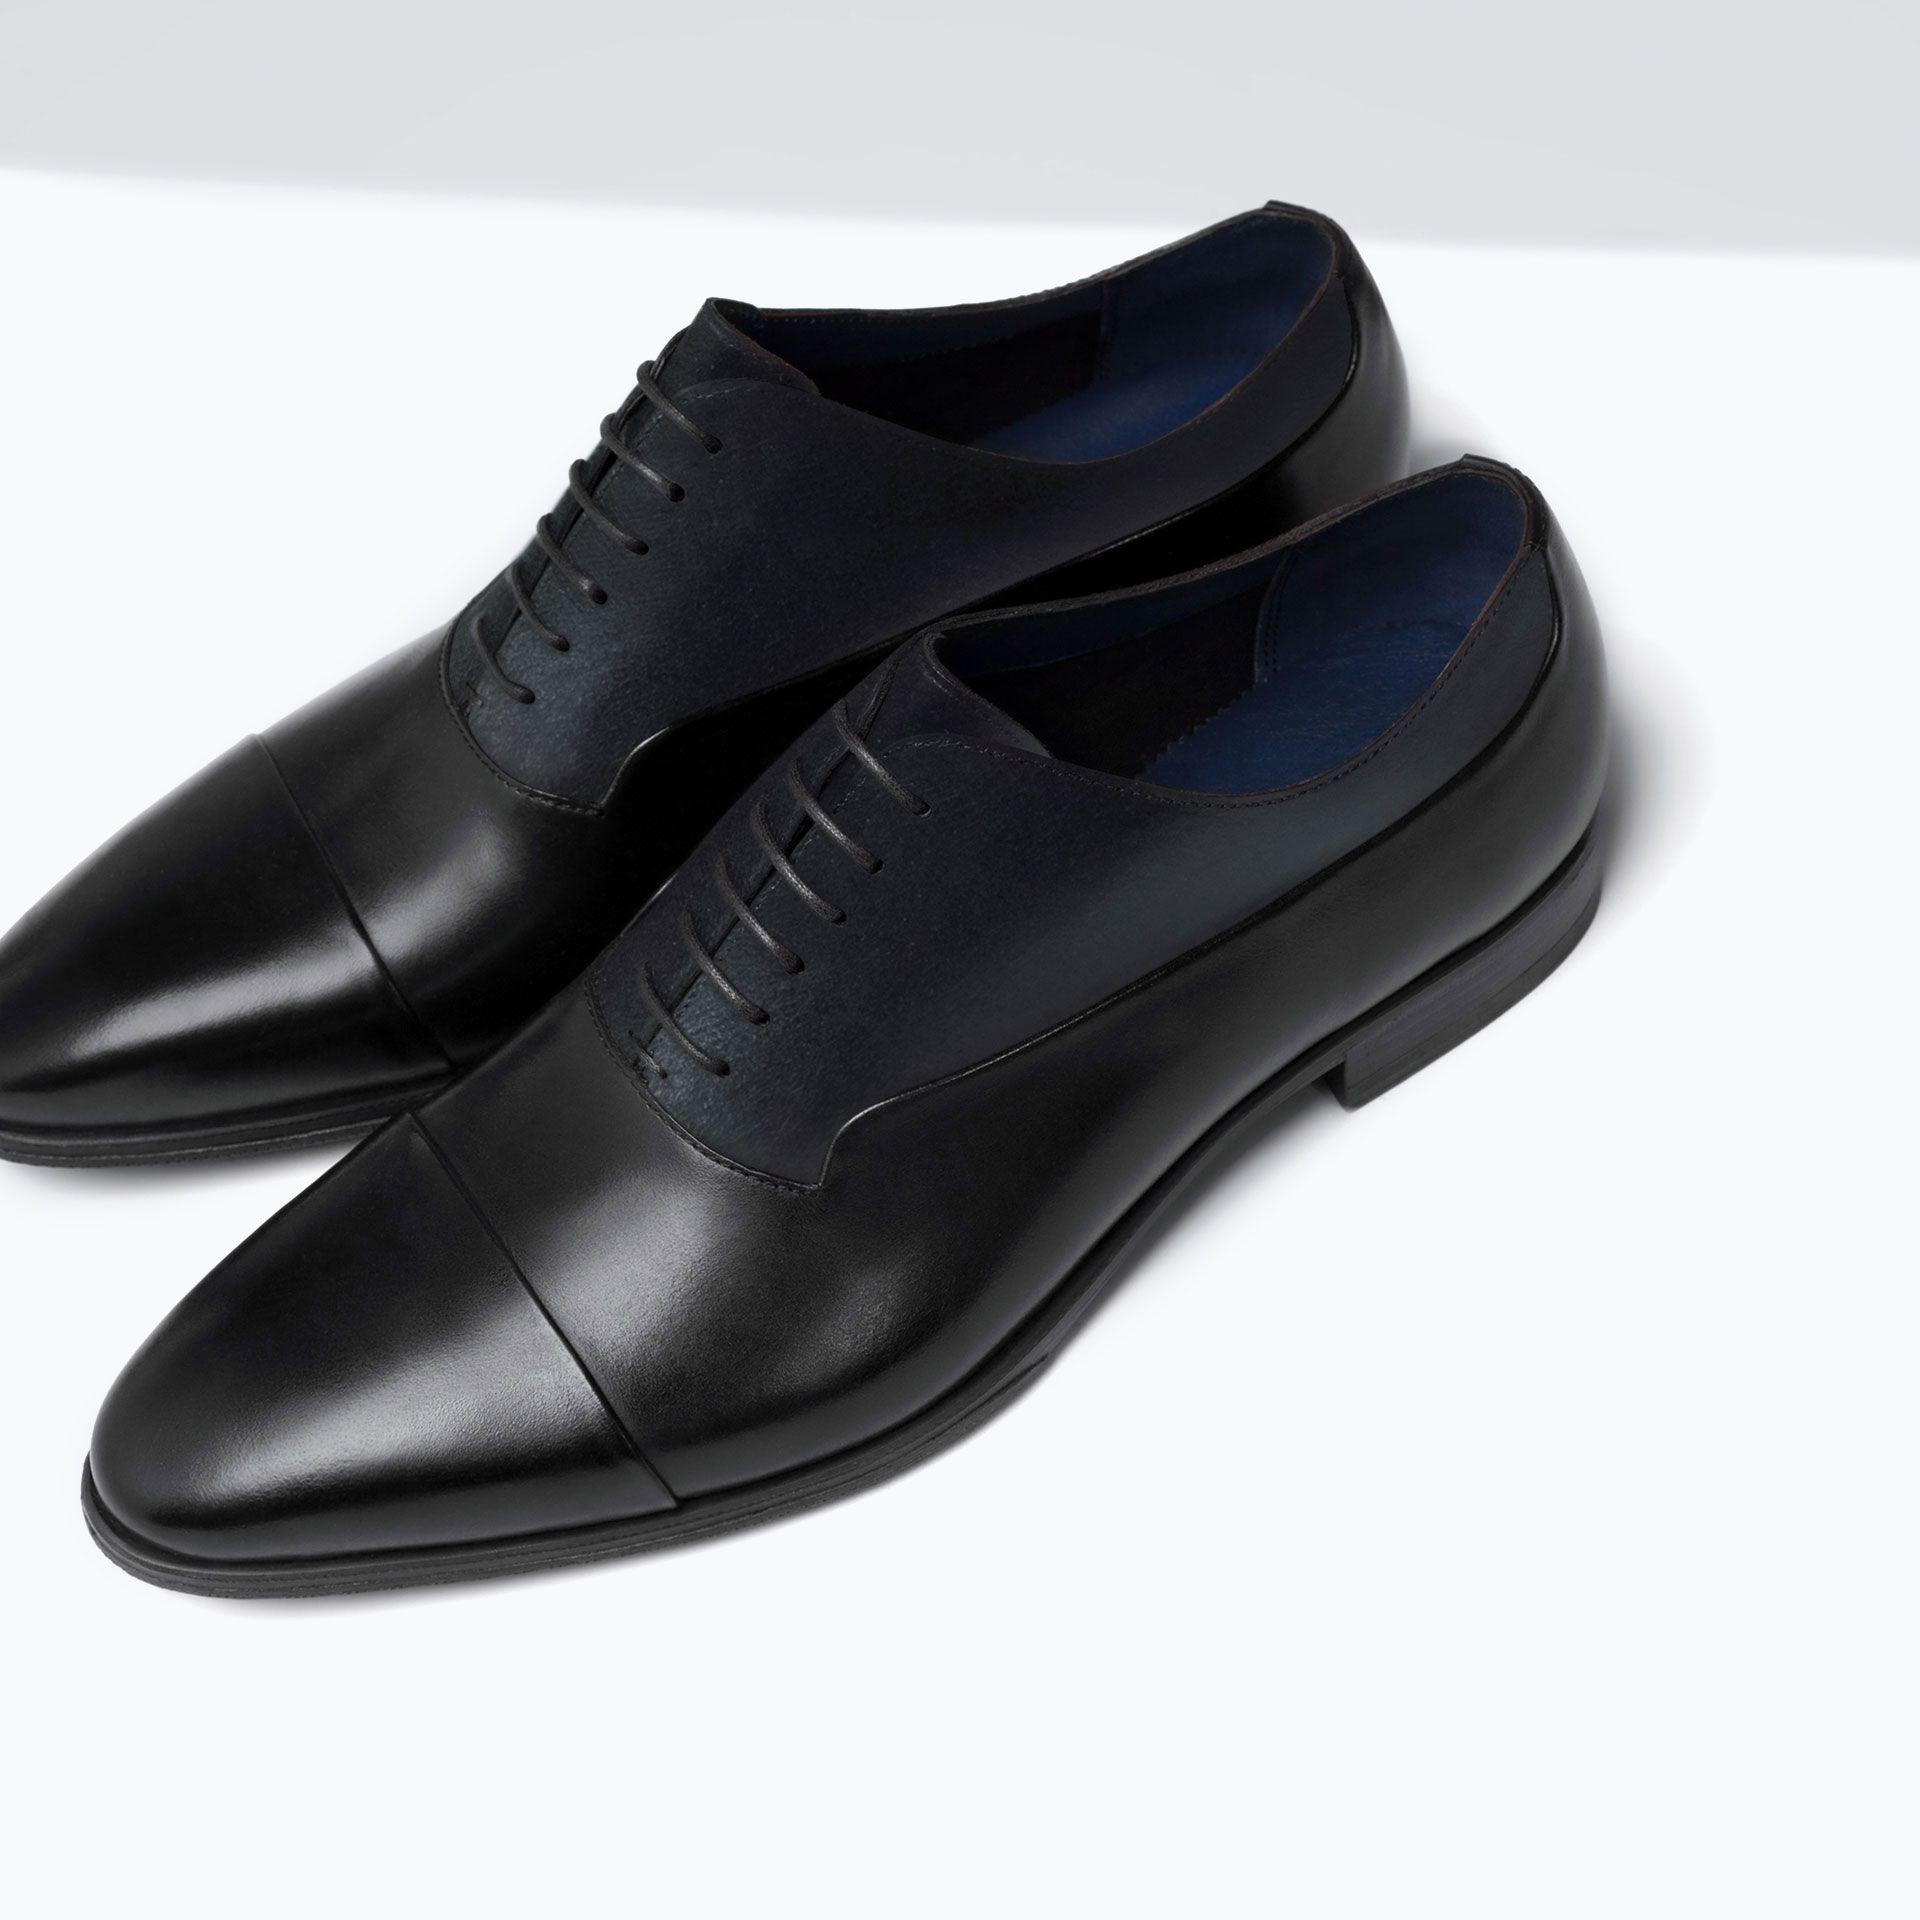 ZARA MAN FASHION BROGUE | Zapatos hombre